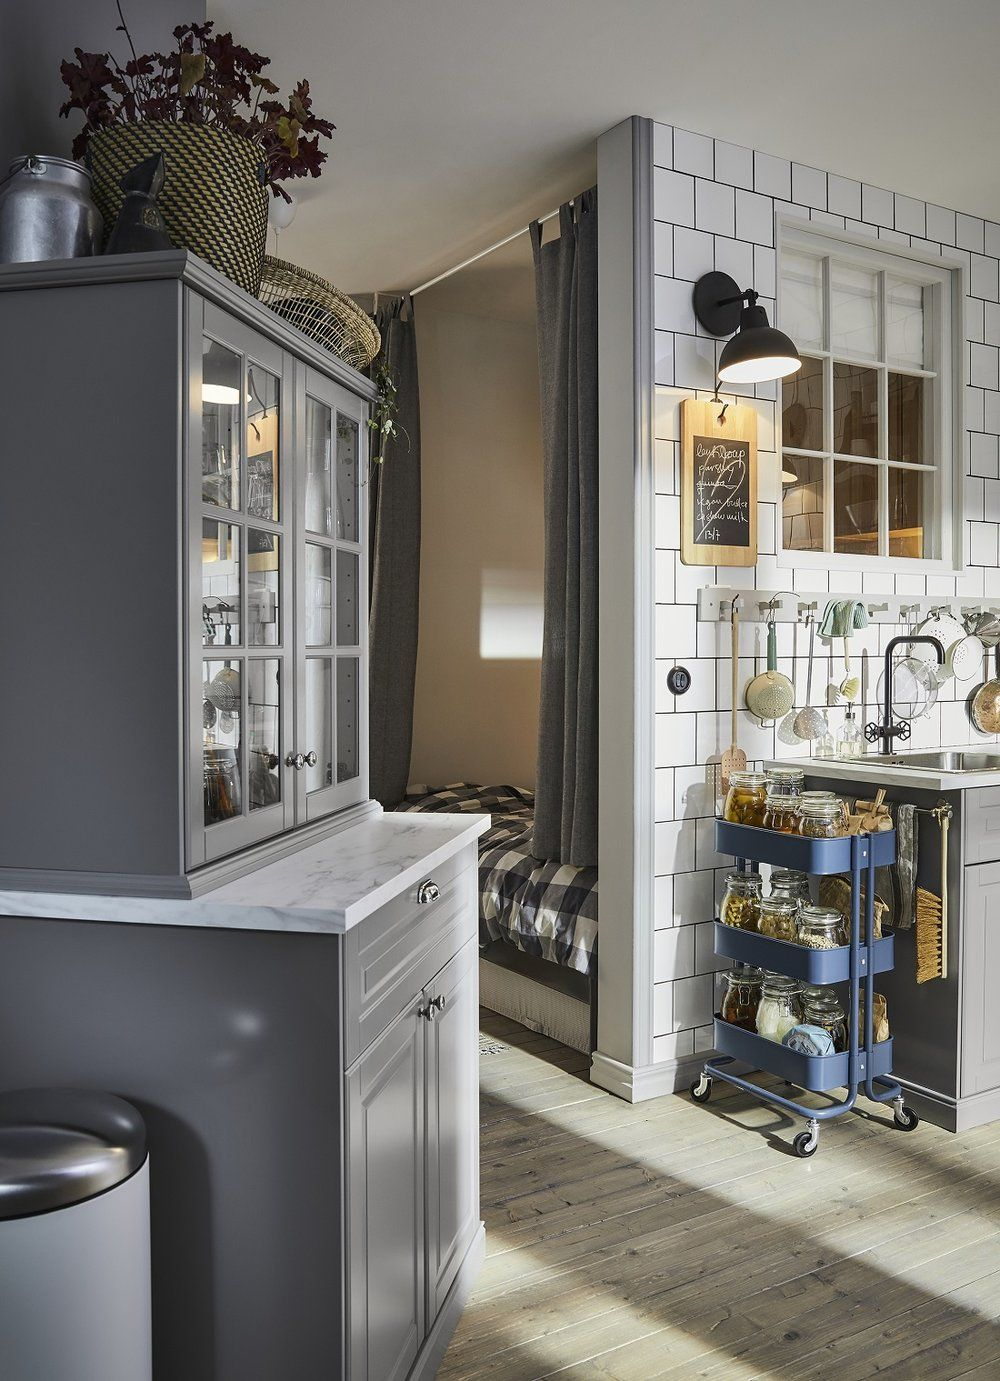 Ikea Kitchens Images 2019